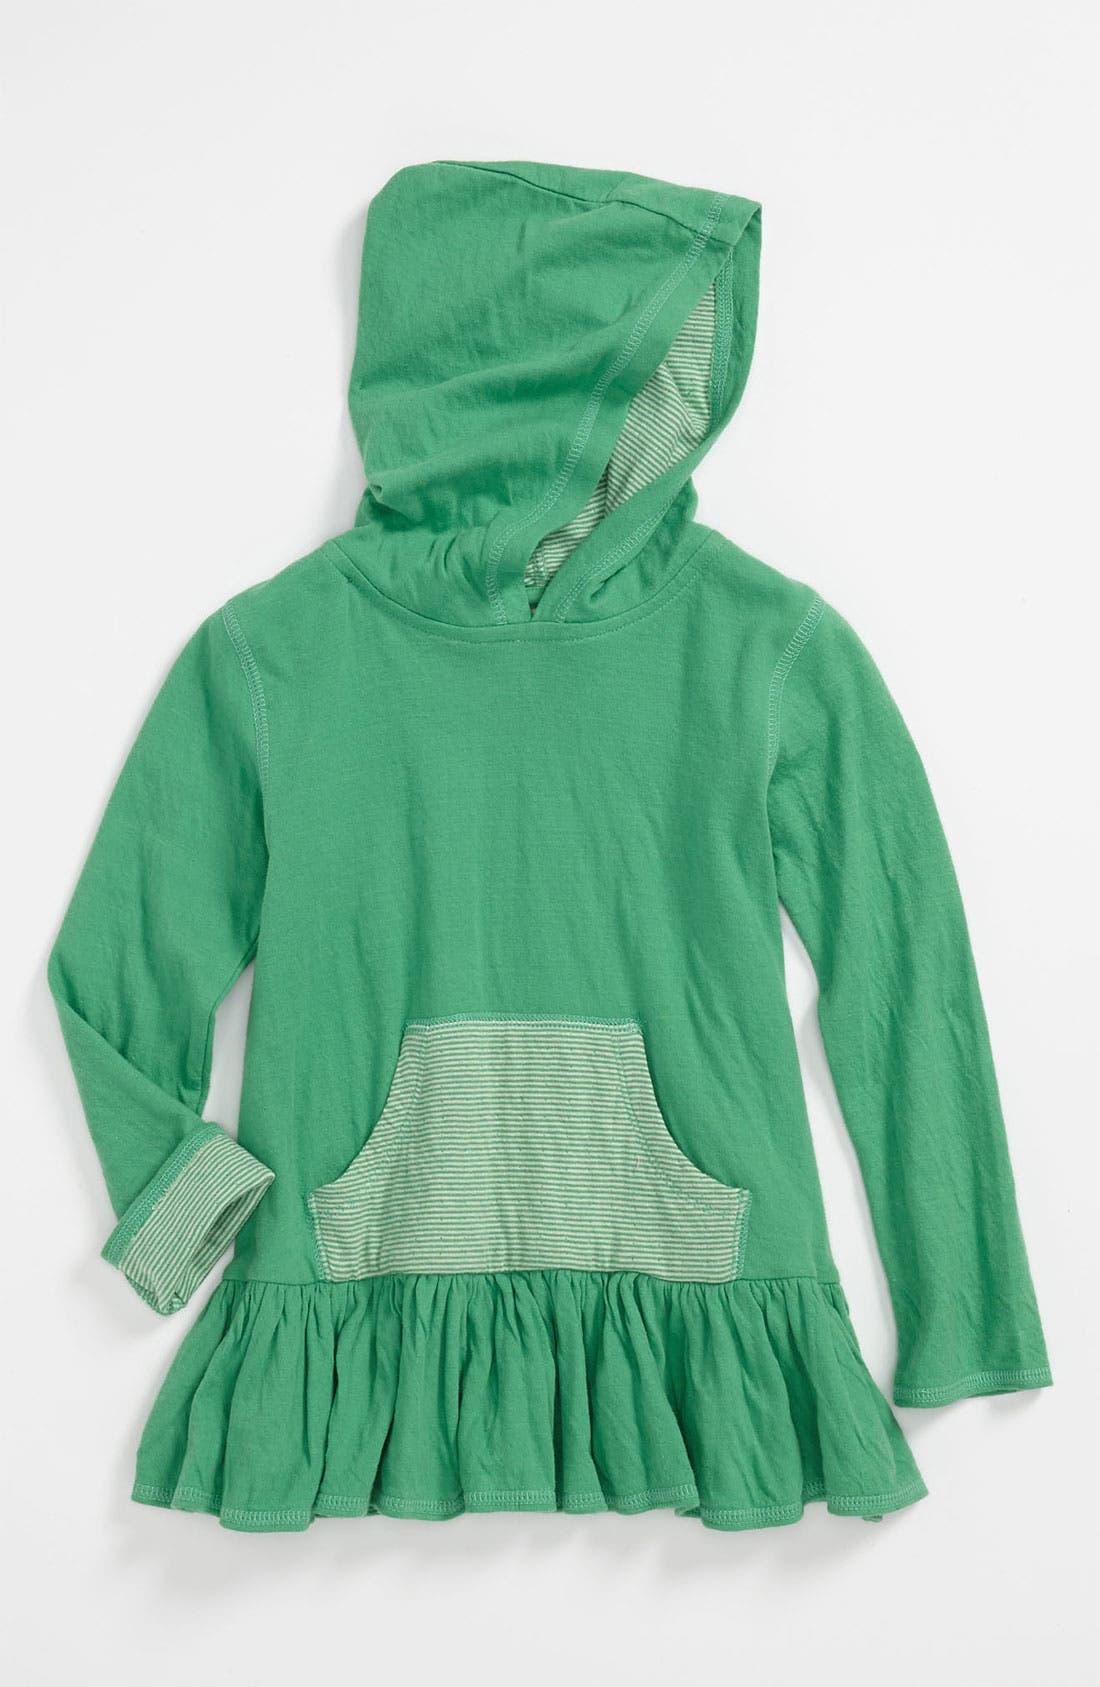 Alternate Image 1 Selected - Tucker + Tate 'Monica' Hooded Tunic (Infant)